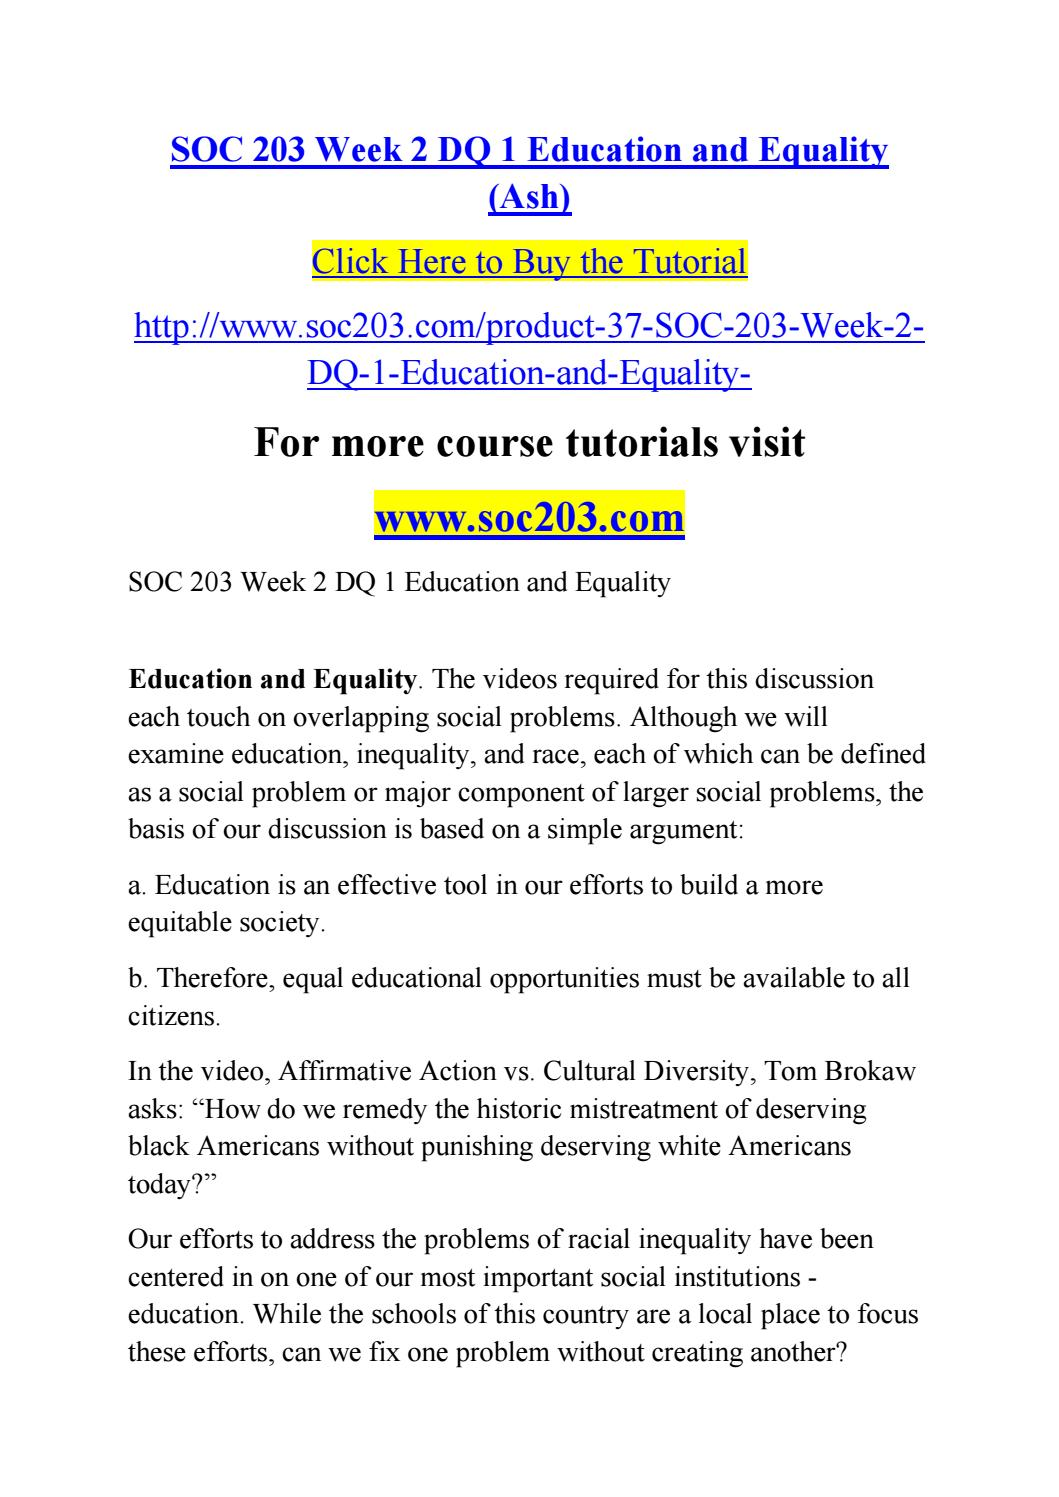 Soc 203 week 2 dq 1 education and equality/ soc203 com by rtgvfgh